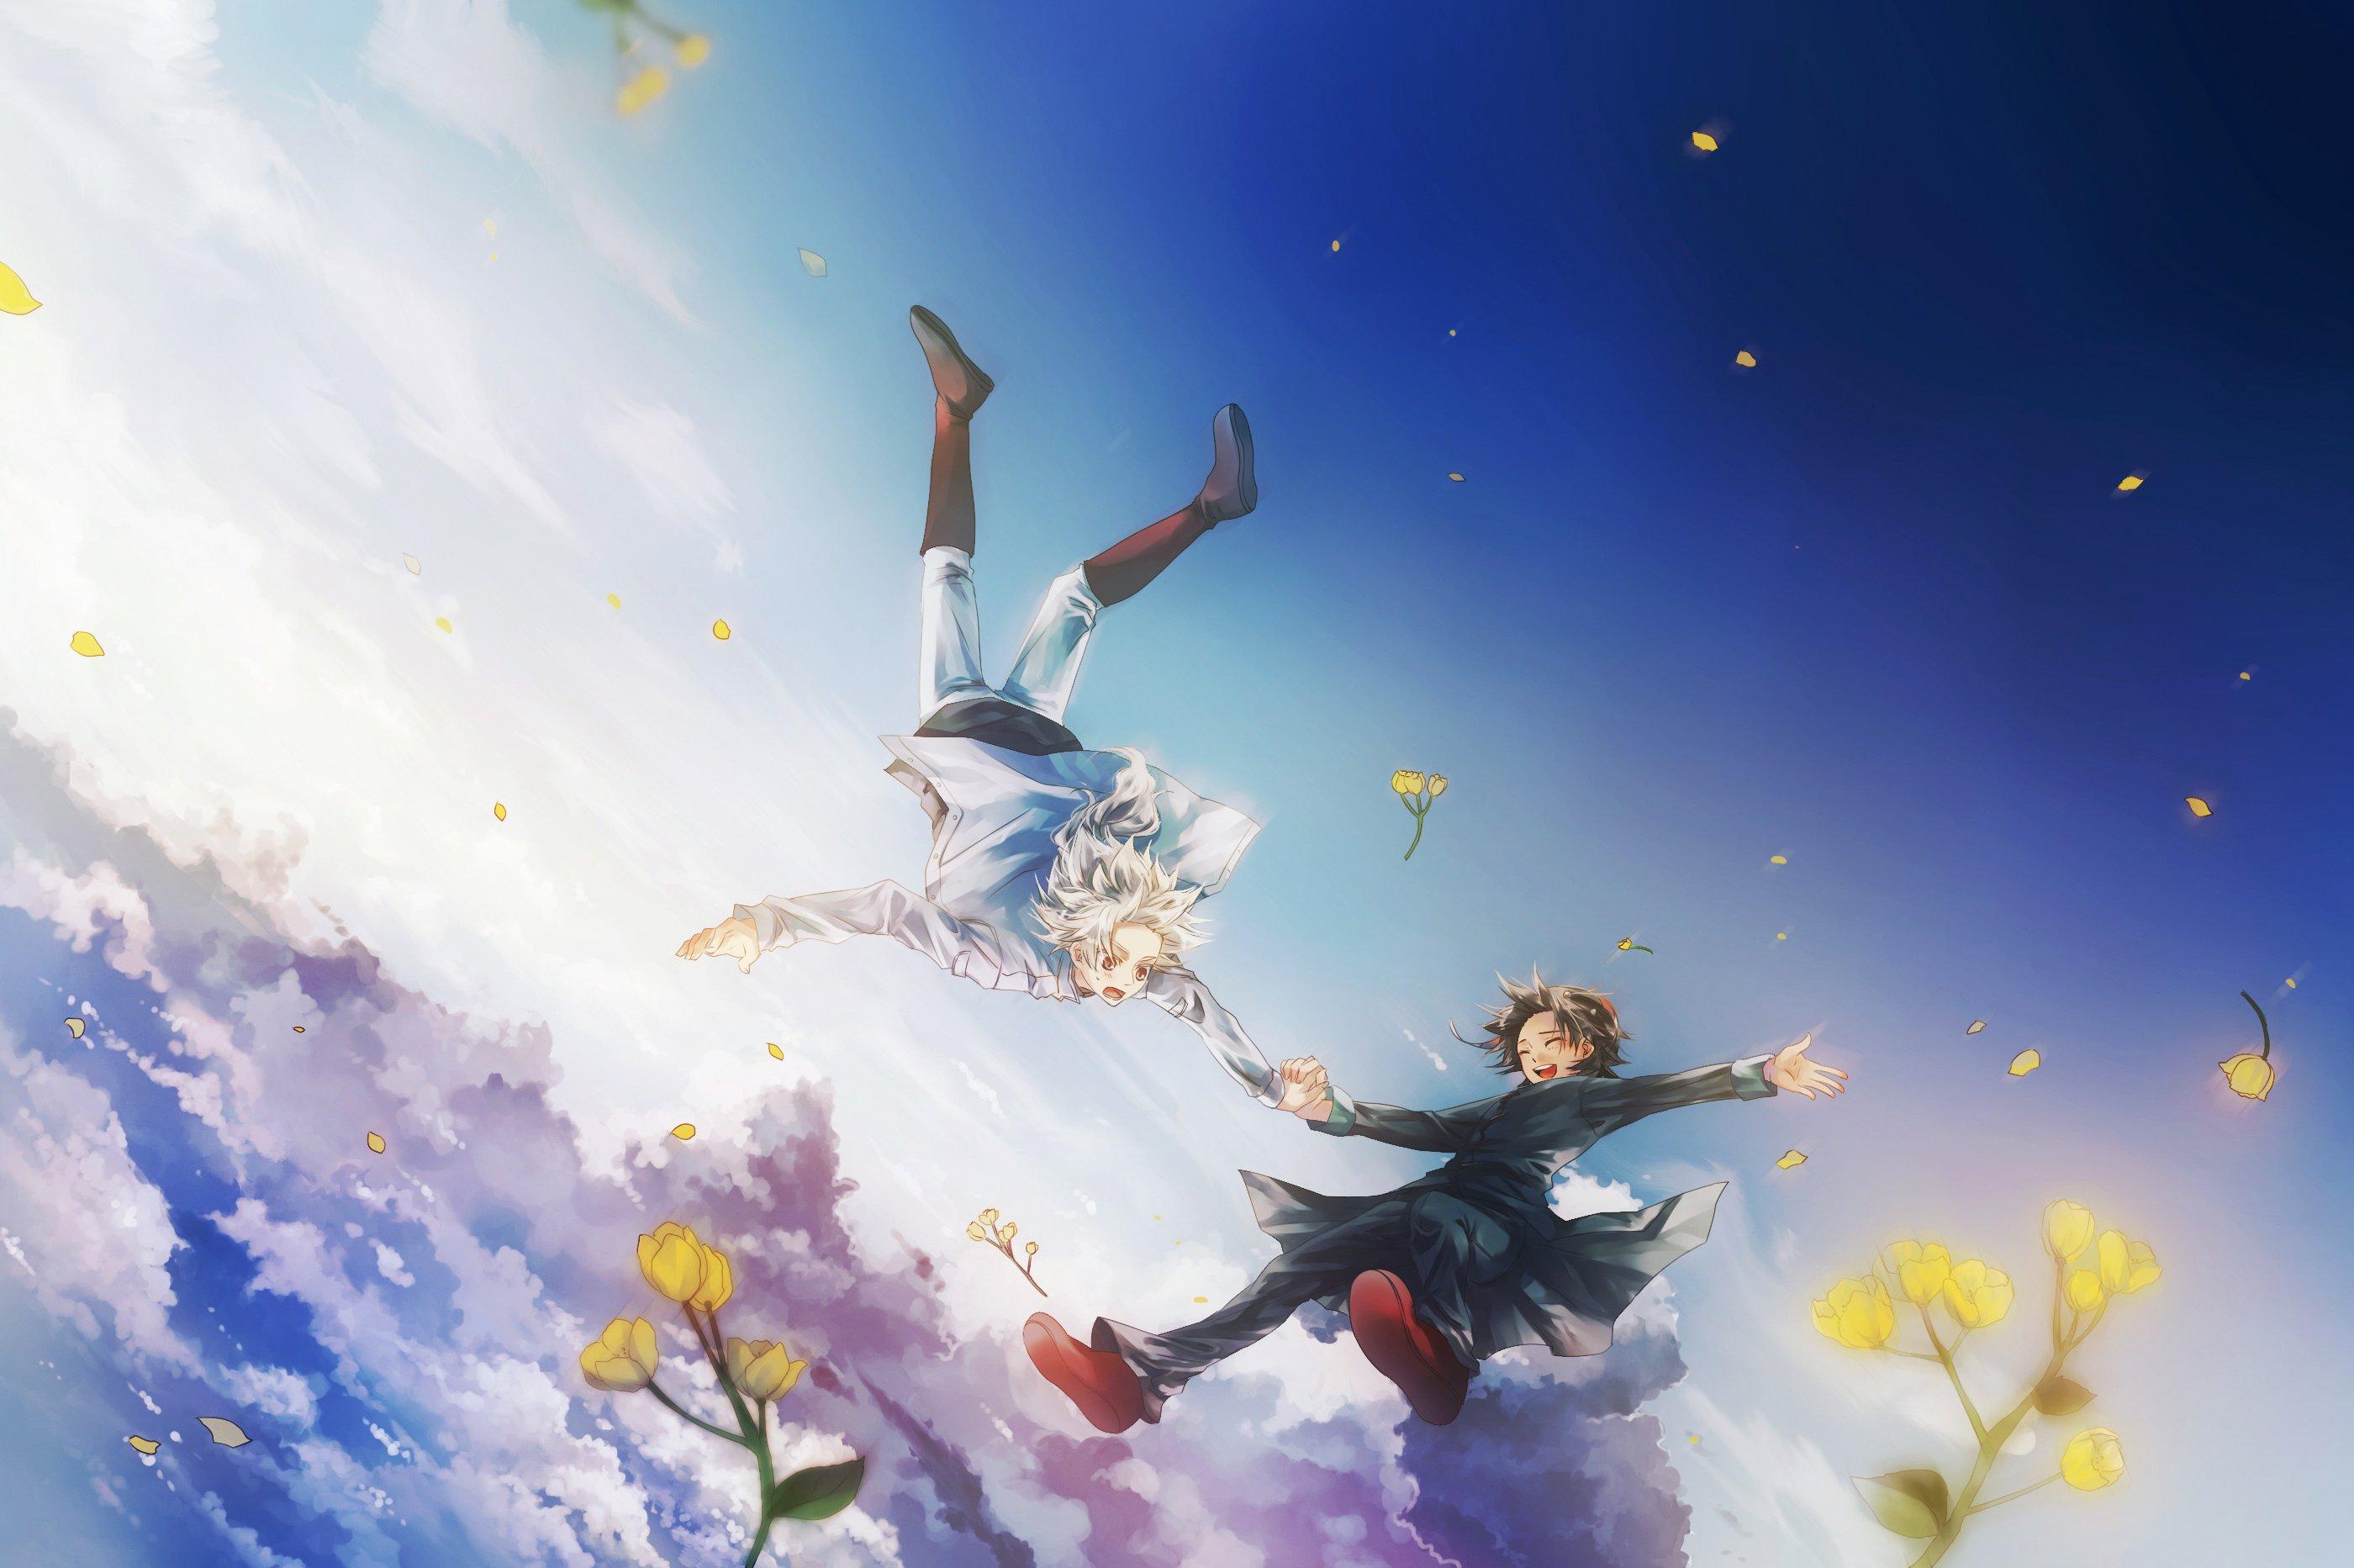 Anime Fly Boys Flower Sky Clouds Wallpaper